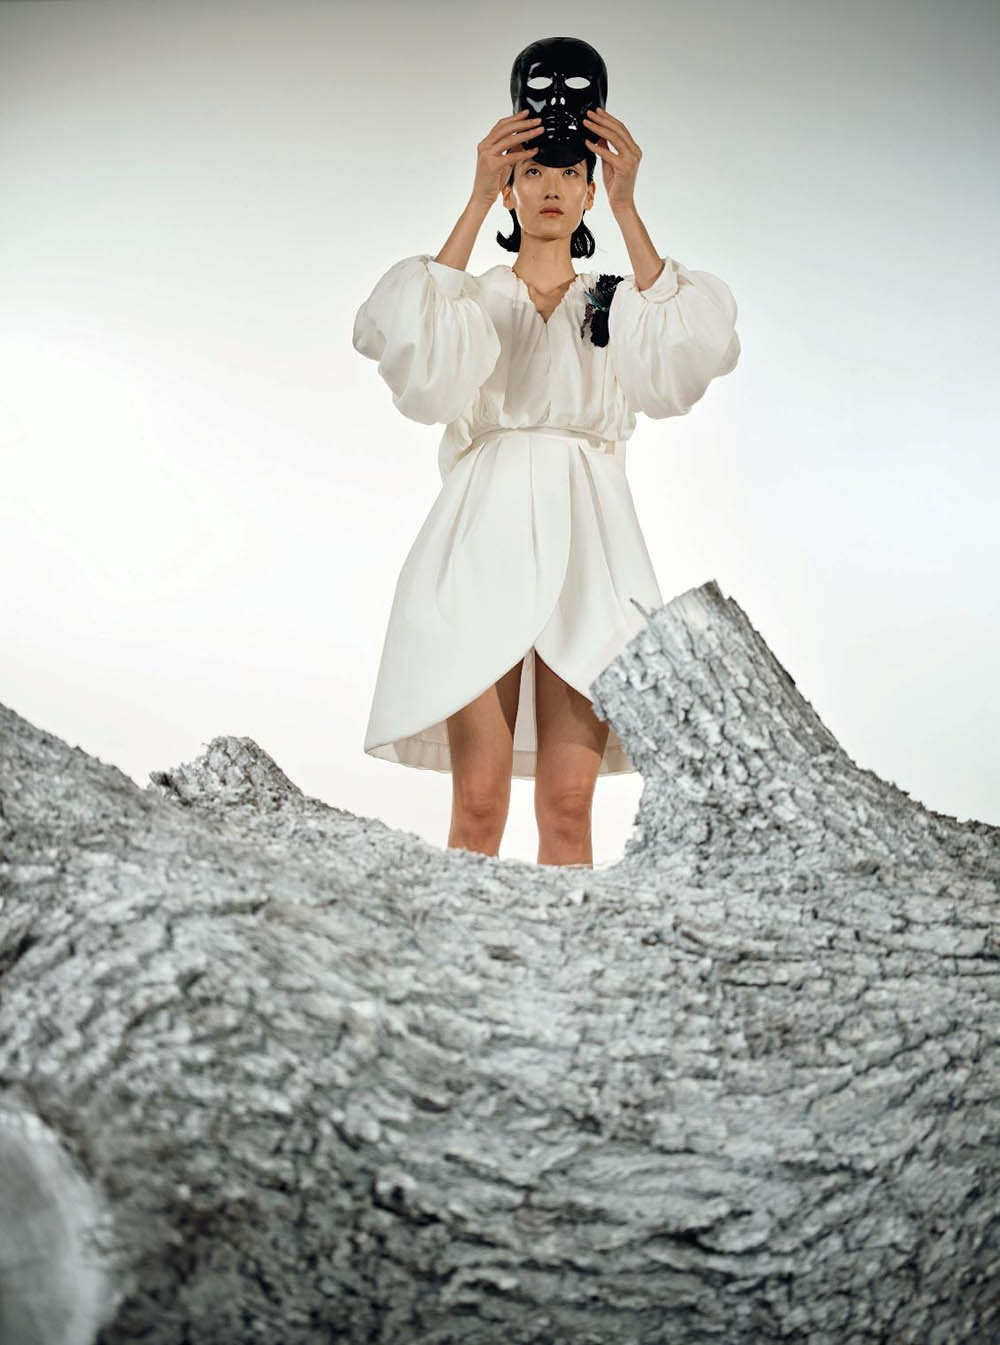 Lina Zhang by Kacper Kasprzyk for Numéro March 2020